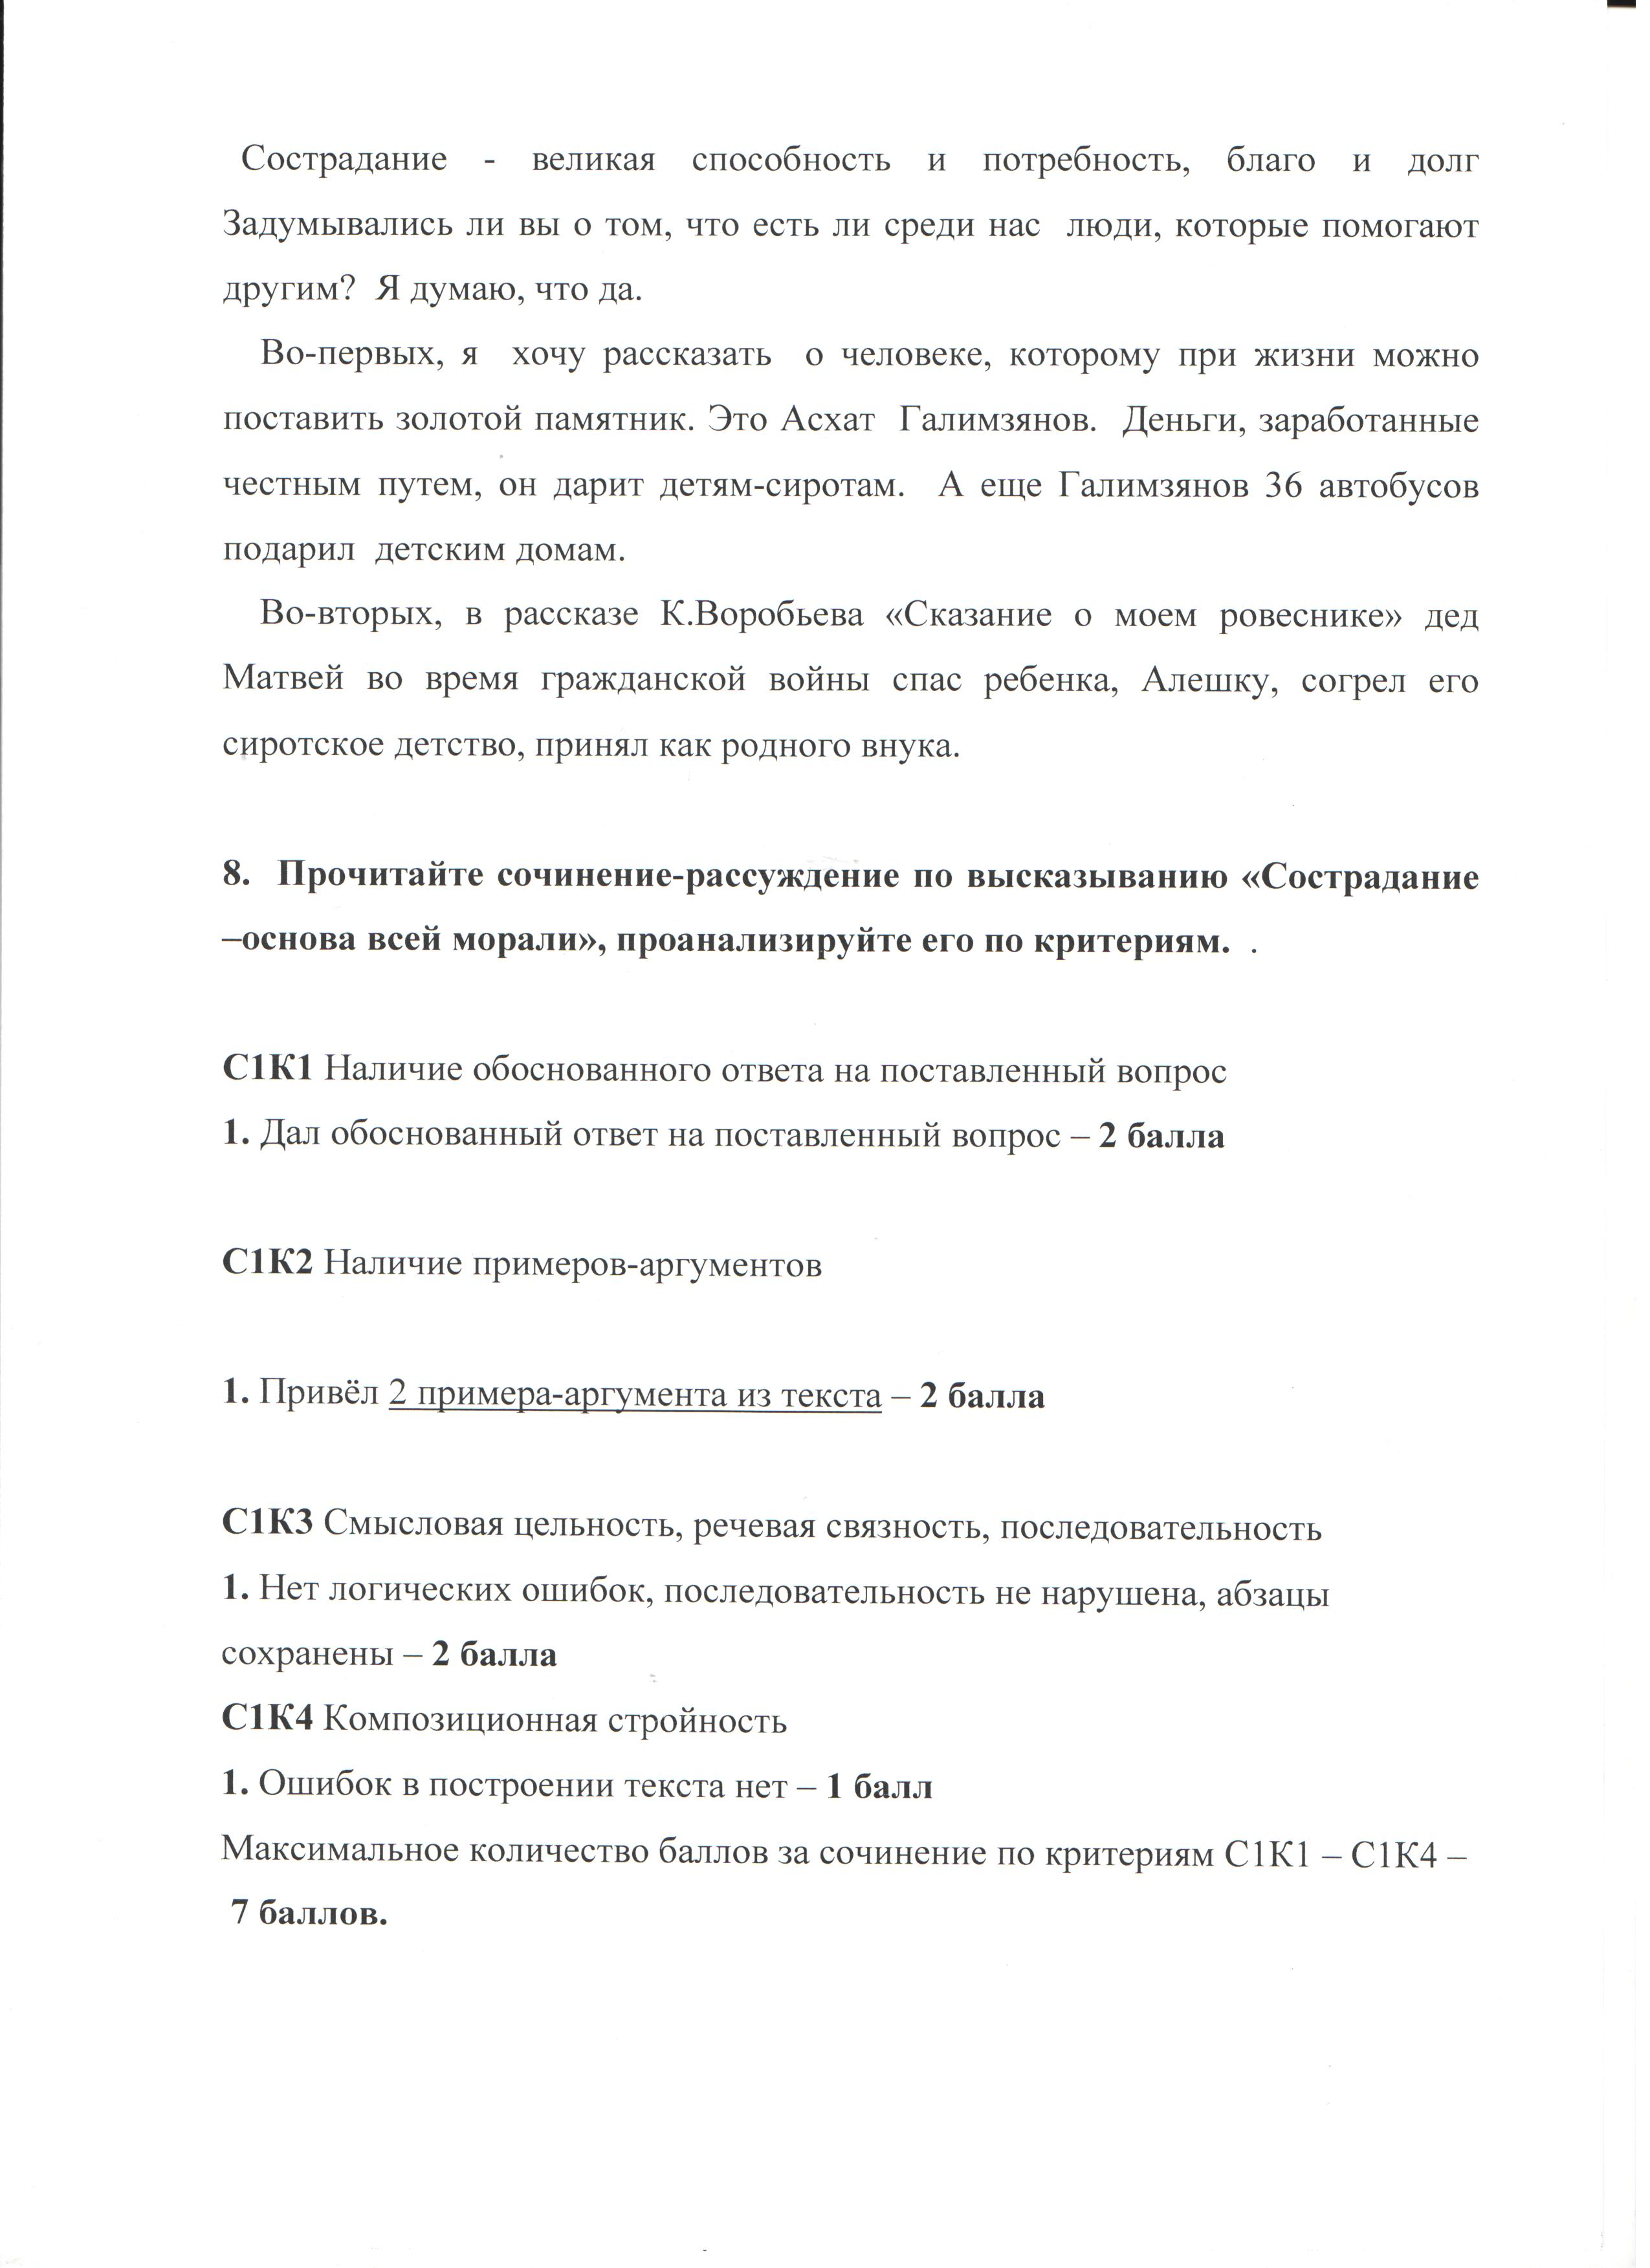 C:\Documents and Settings\Admin\Мои документы\Мои рисунки\Изображение 011.jpg